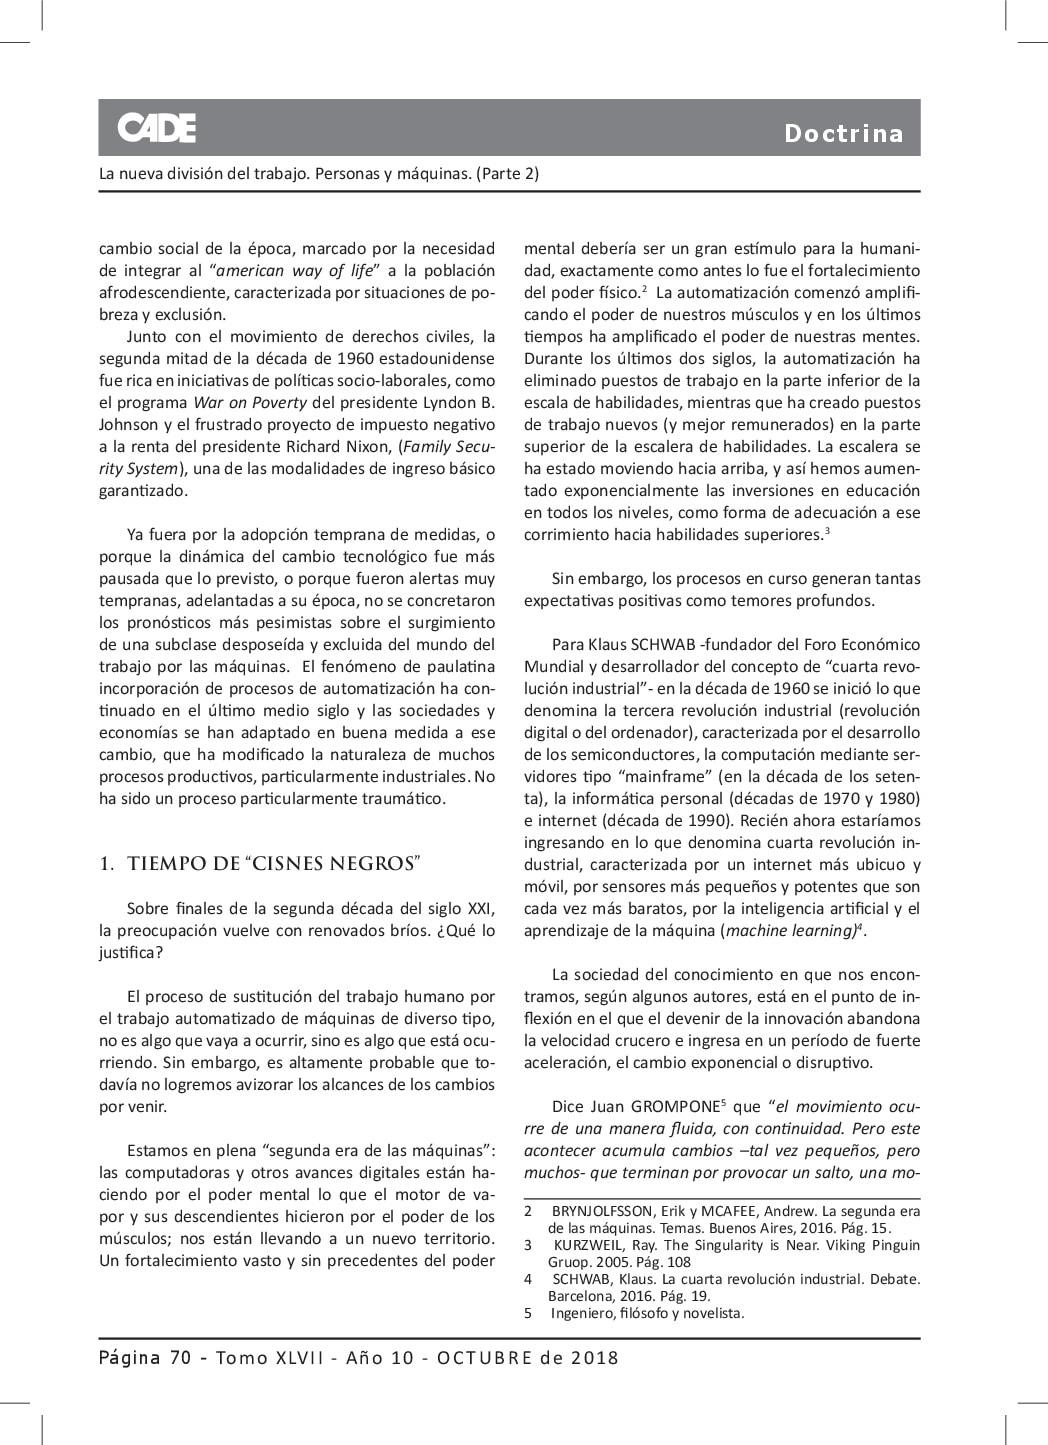 cade-doctrina-jurisprudencia-saldain-002